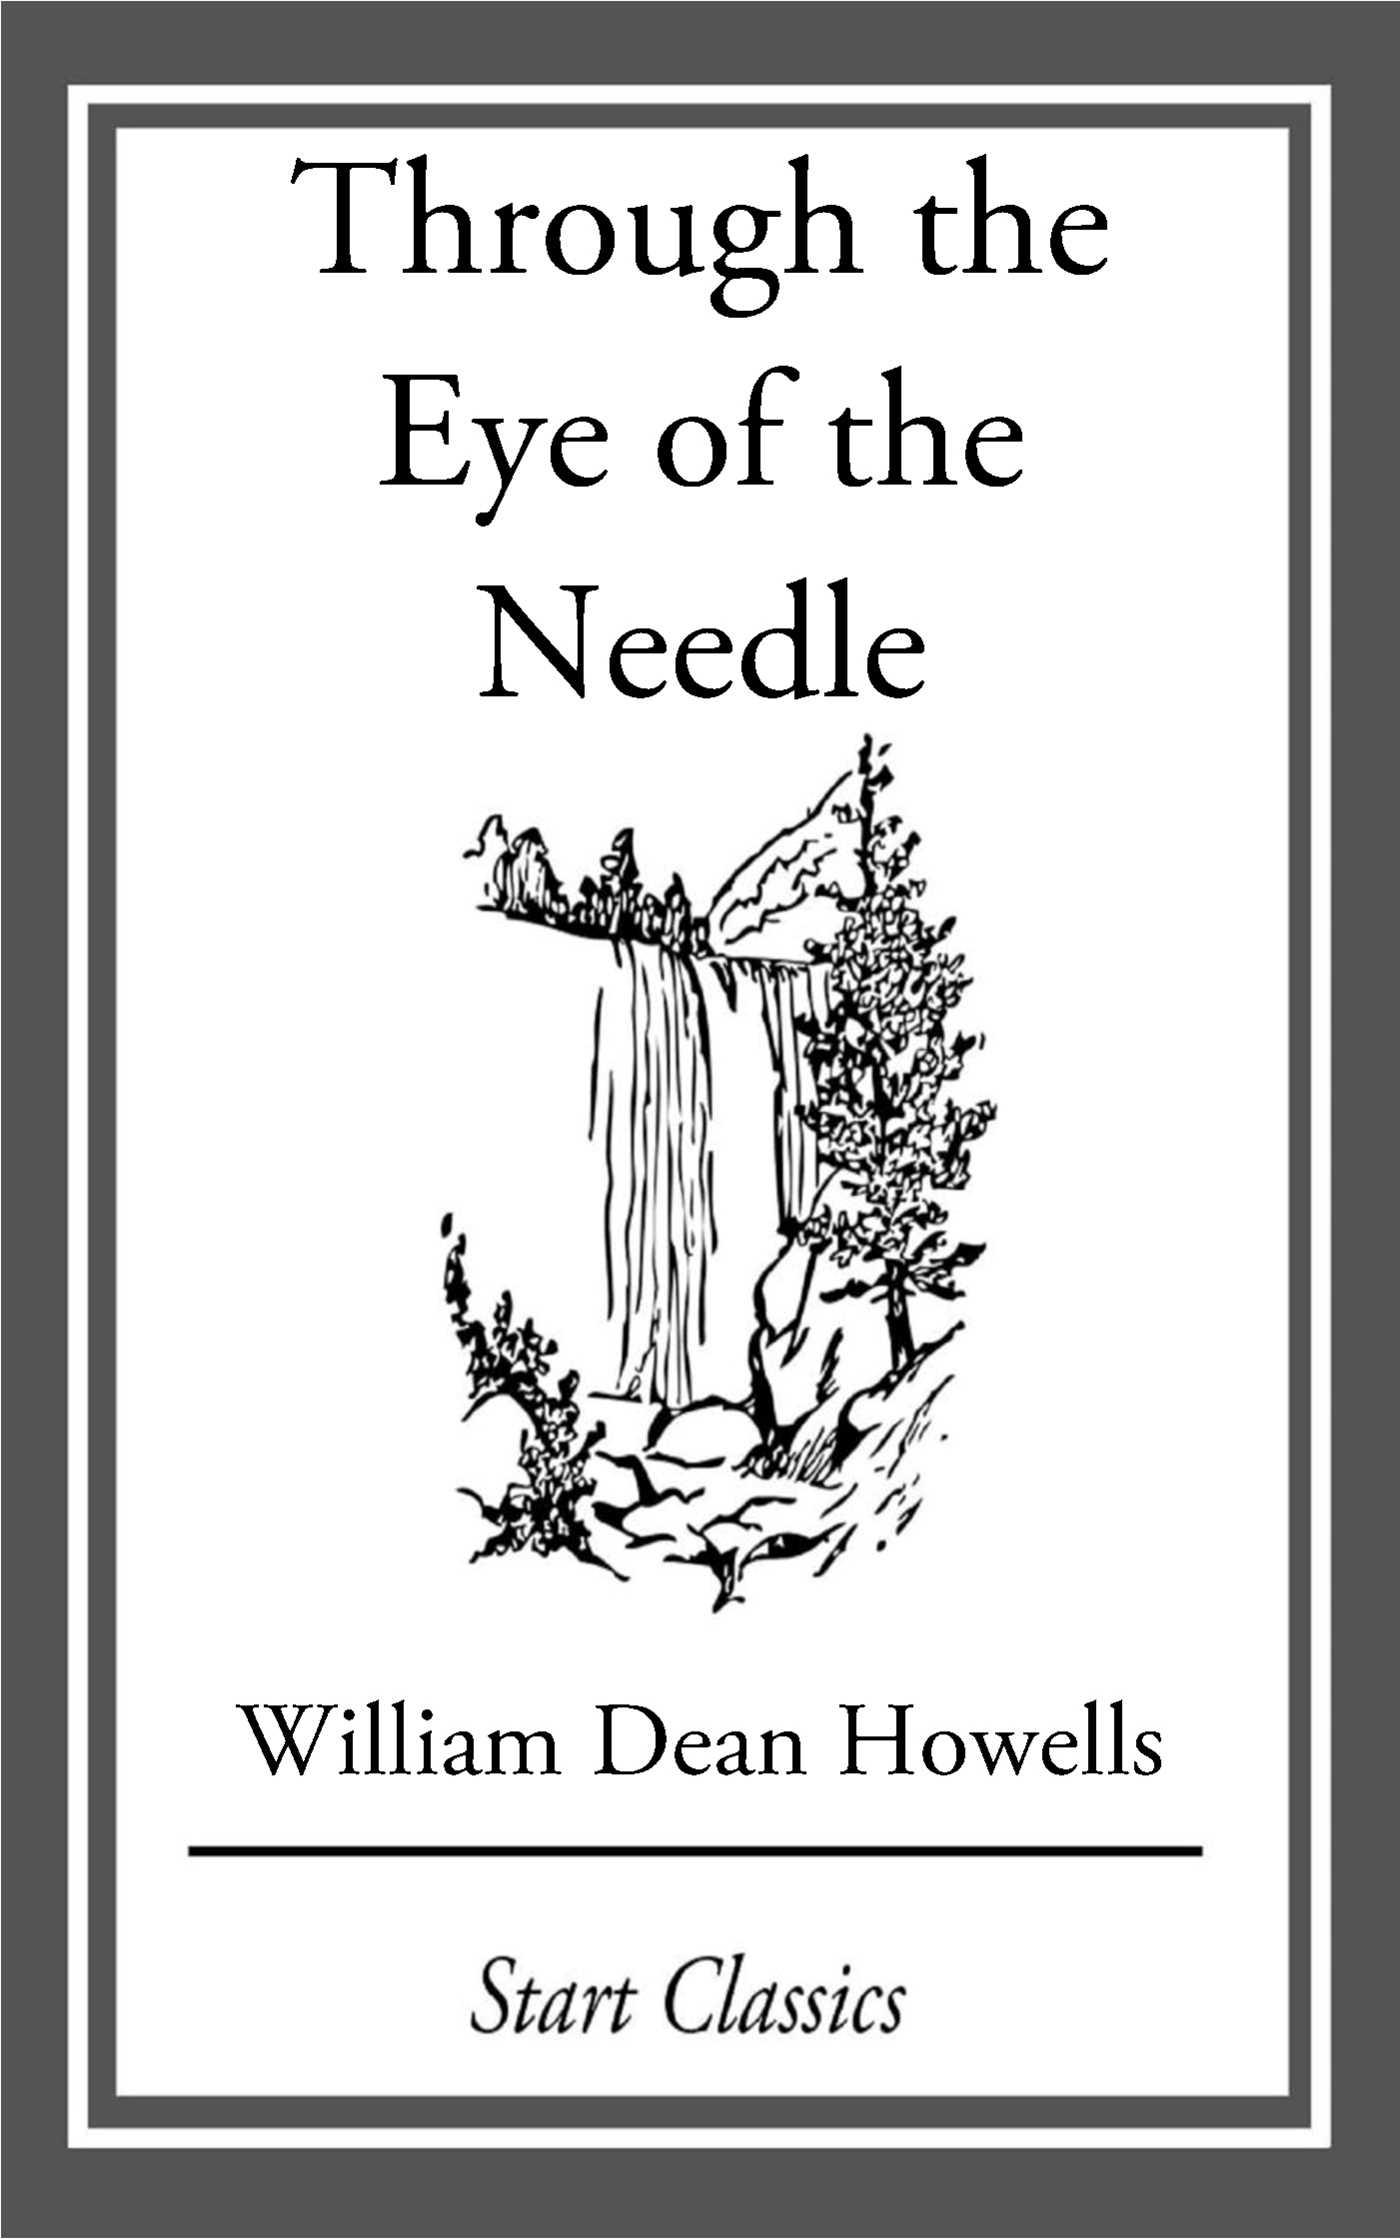 Through the eye of the needle 9781633555631 hr